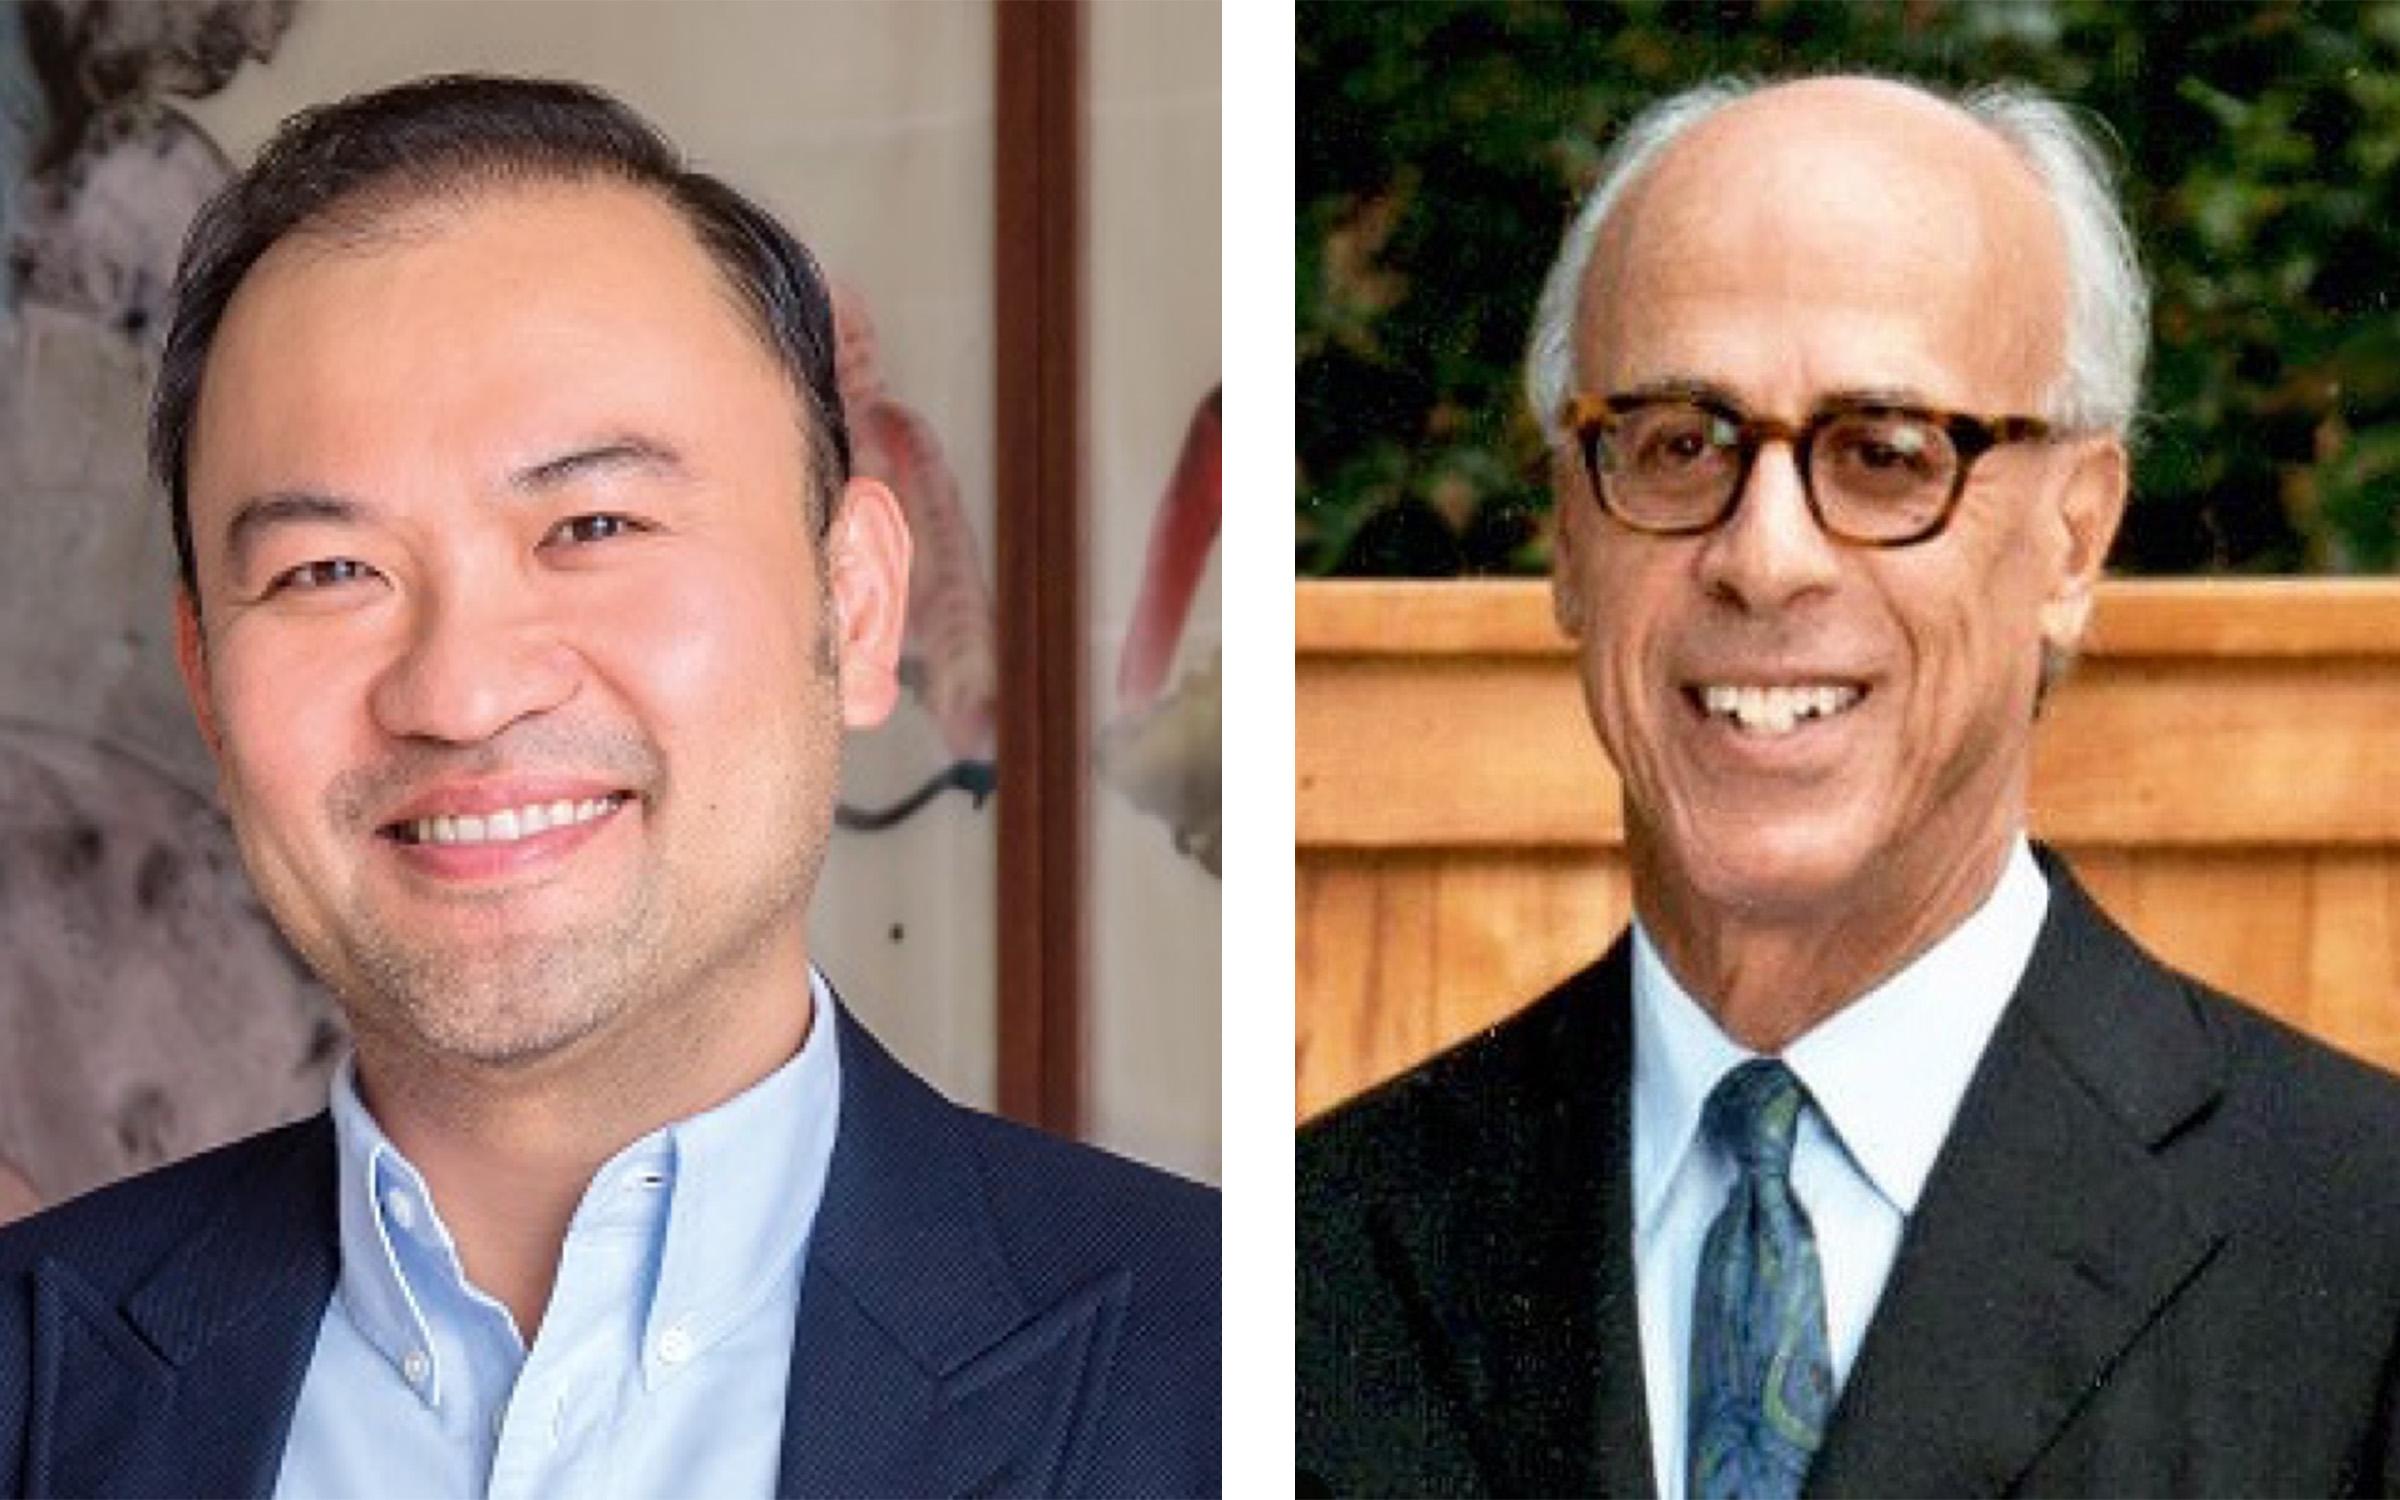 Disaphol Chansiri of Bangkok and Steven M. Sumberg of Washington, D.C.